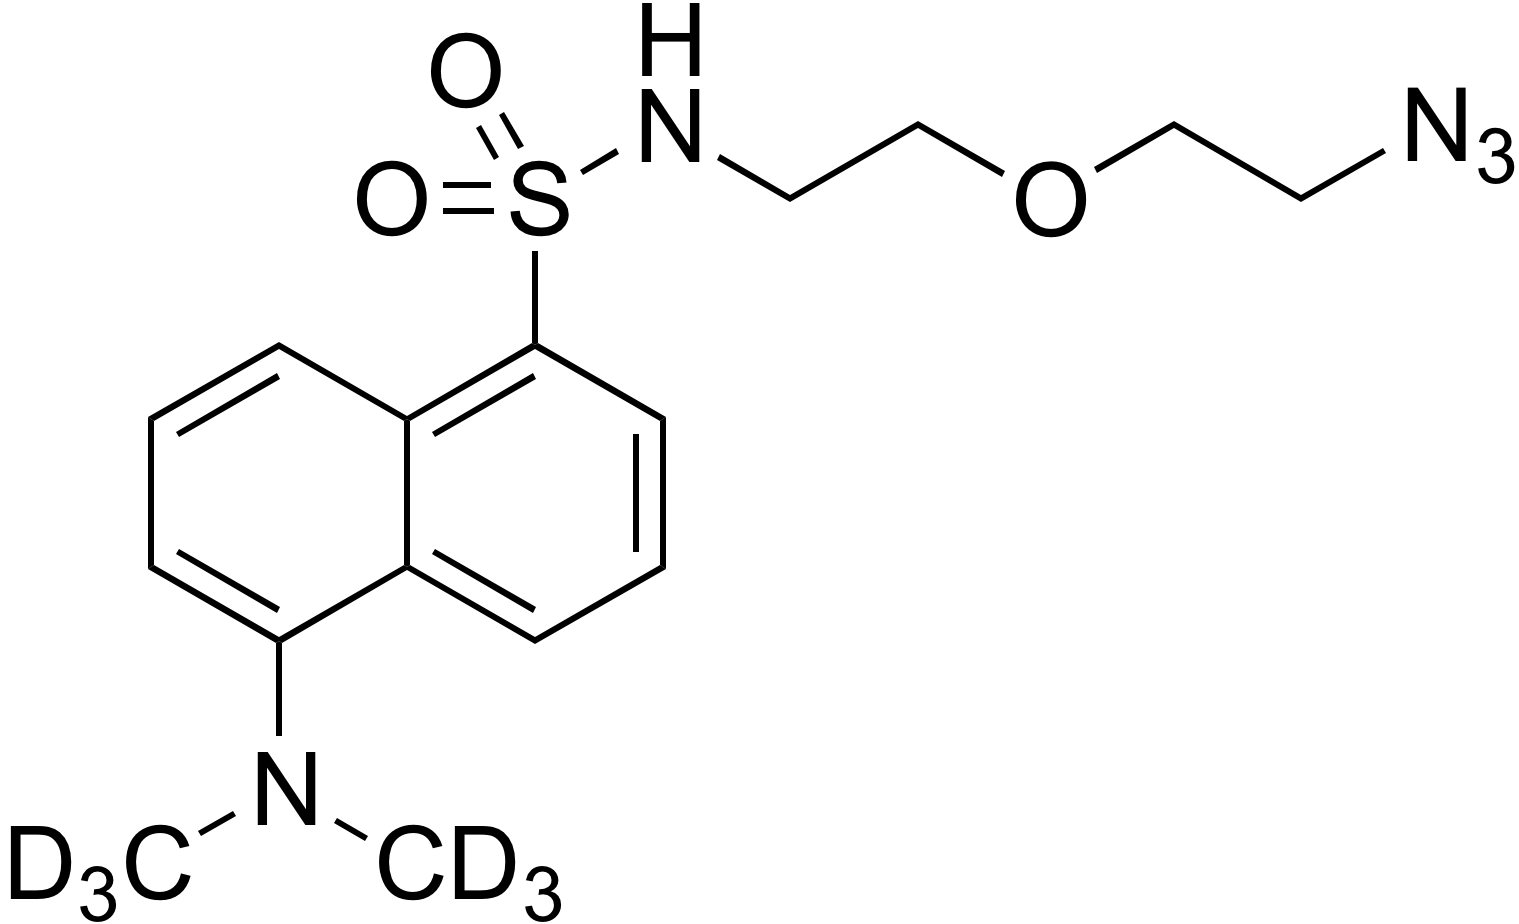 Dansyl-d<sub>6</sub> 2-(2-azidoethoxy)ethanamine